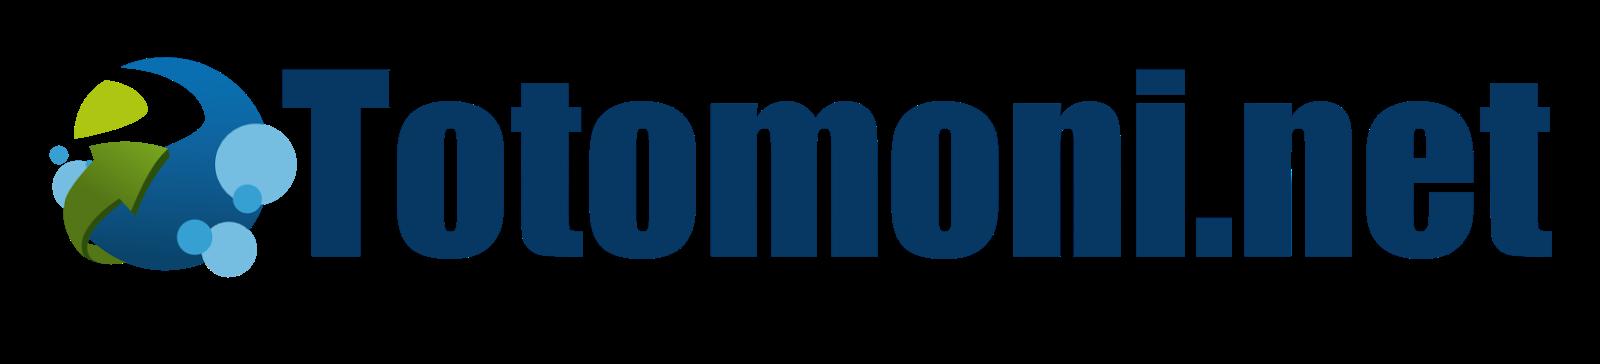 Totomoni.net